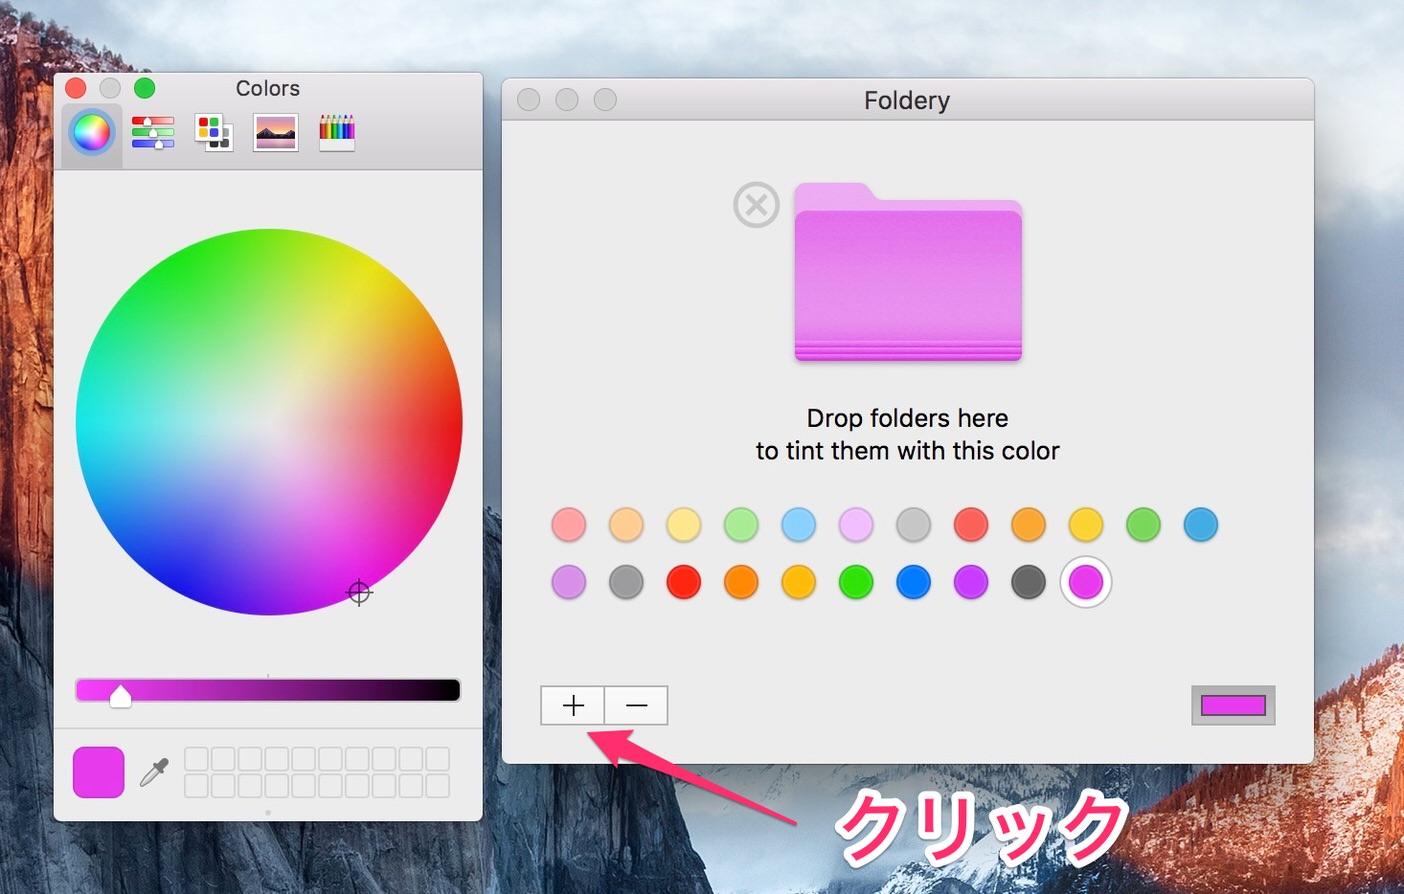 Folderyで任意のカラーを設定